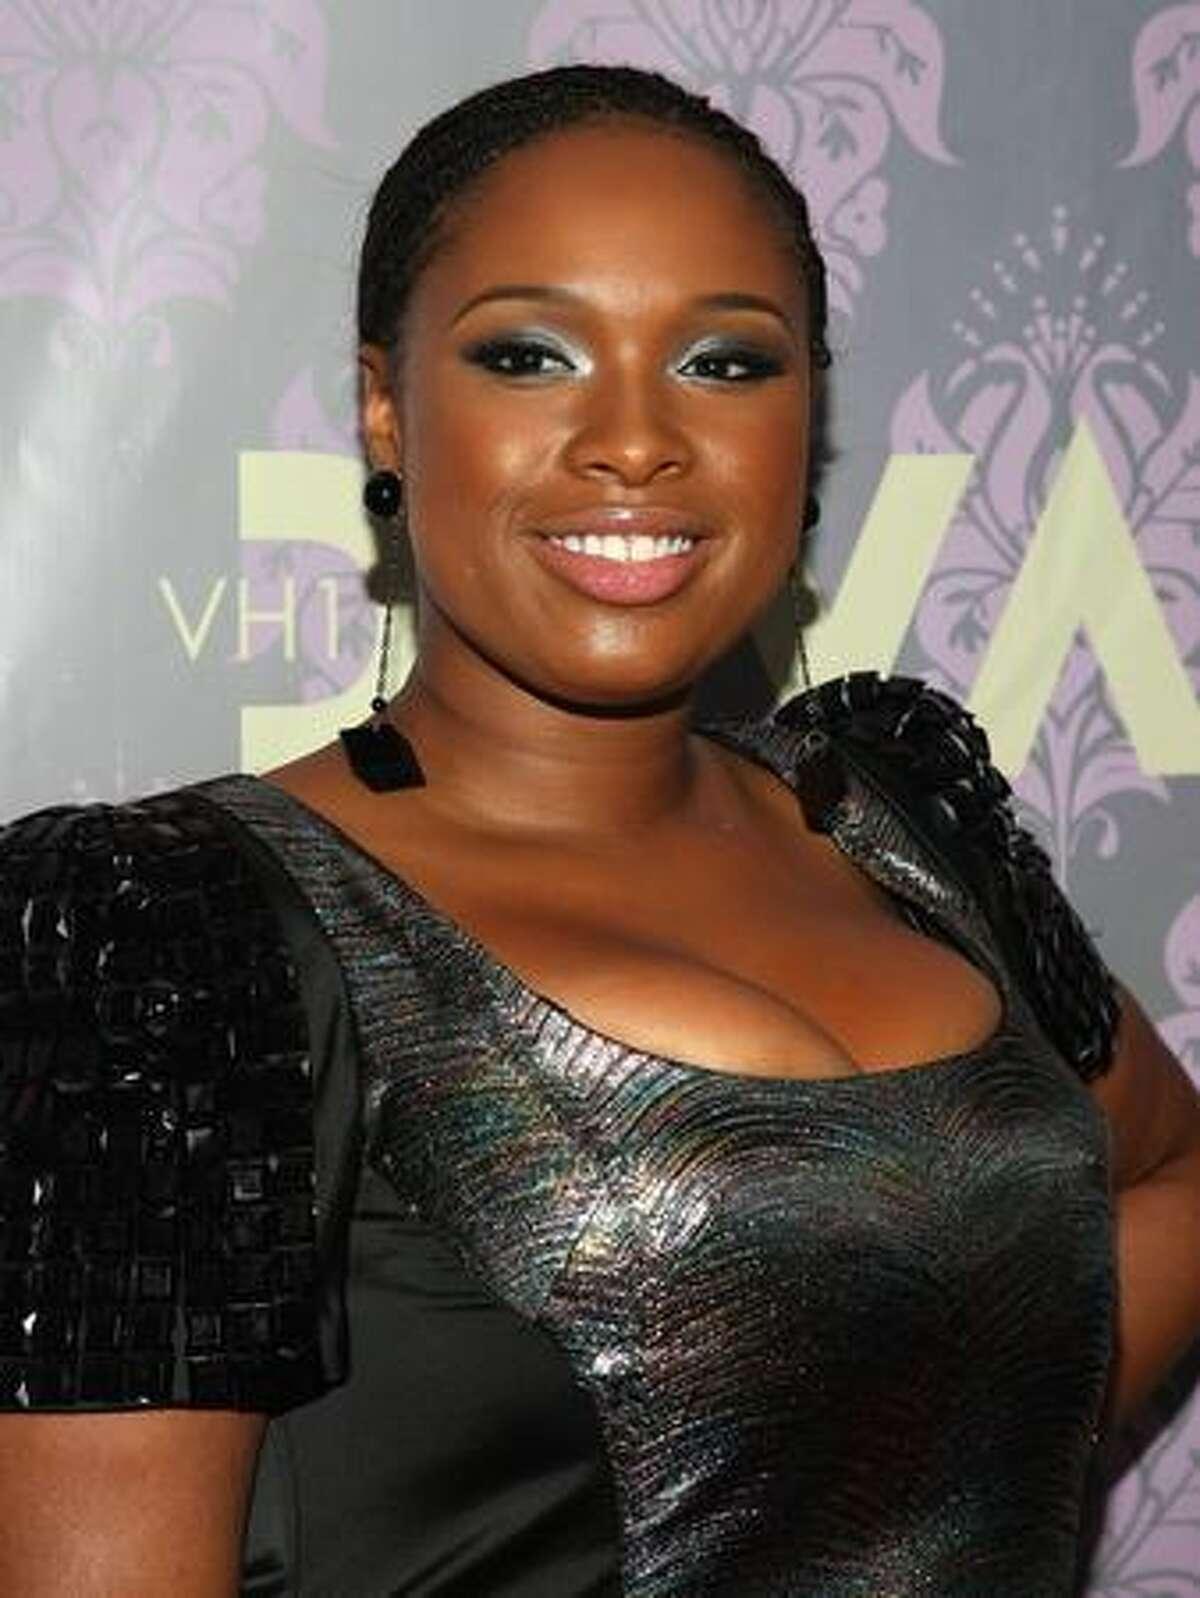 Singer Jennifer Hudson attends 2009 VH1 Divas at Brooklyn Academy of Music in New York on Thursday, Sept. 17, 2009.